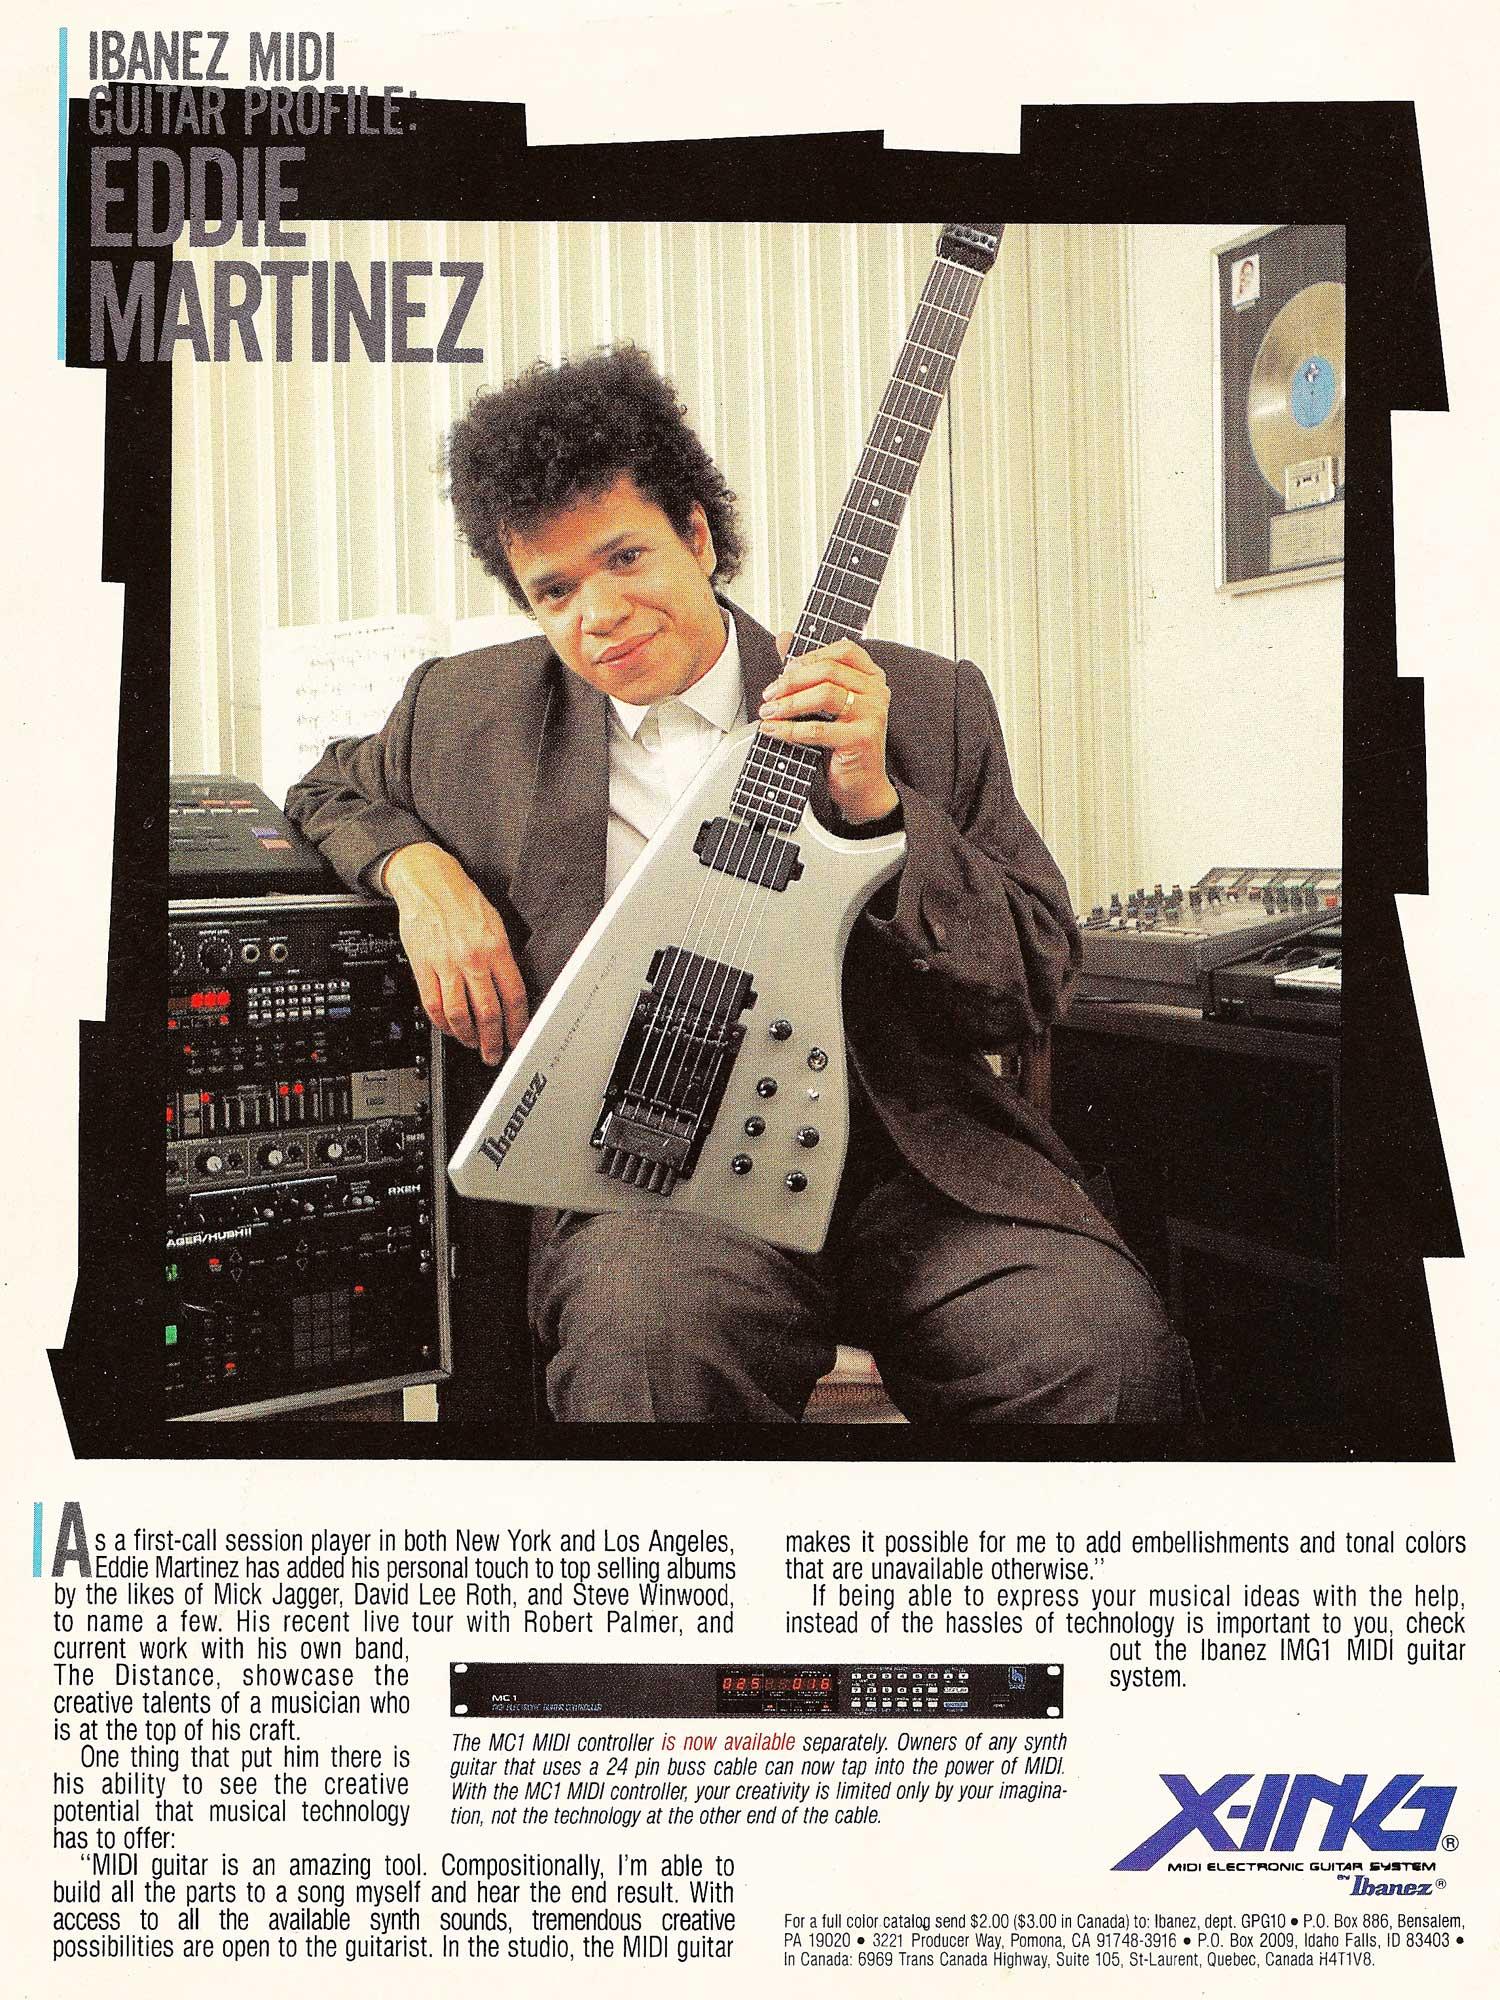 Ibanez MC1 Guitar-to-MIDI Pitch-to MIDI Converter